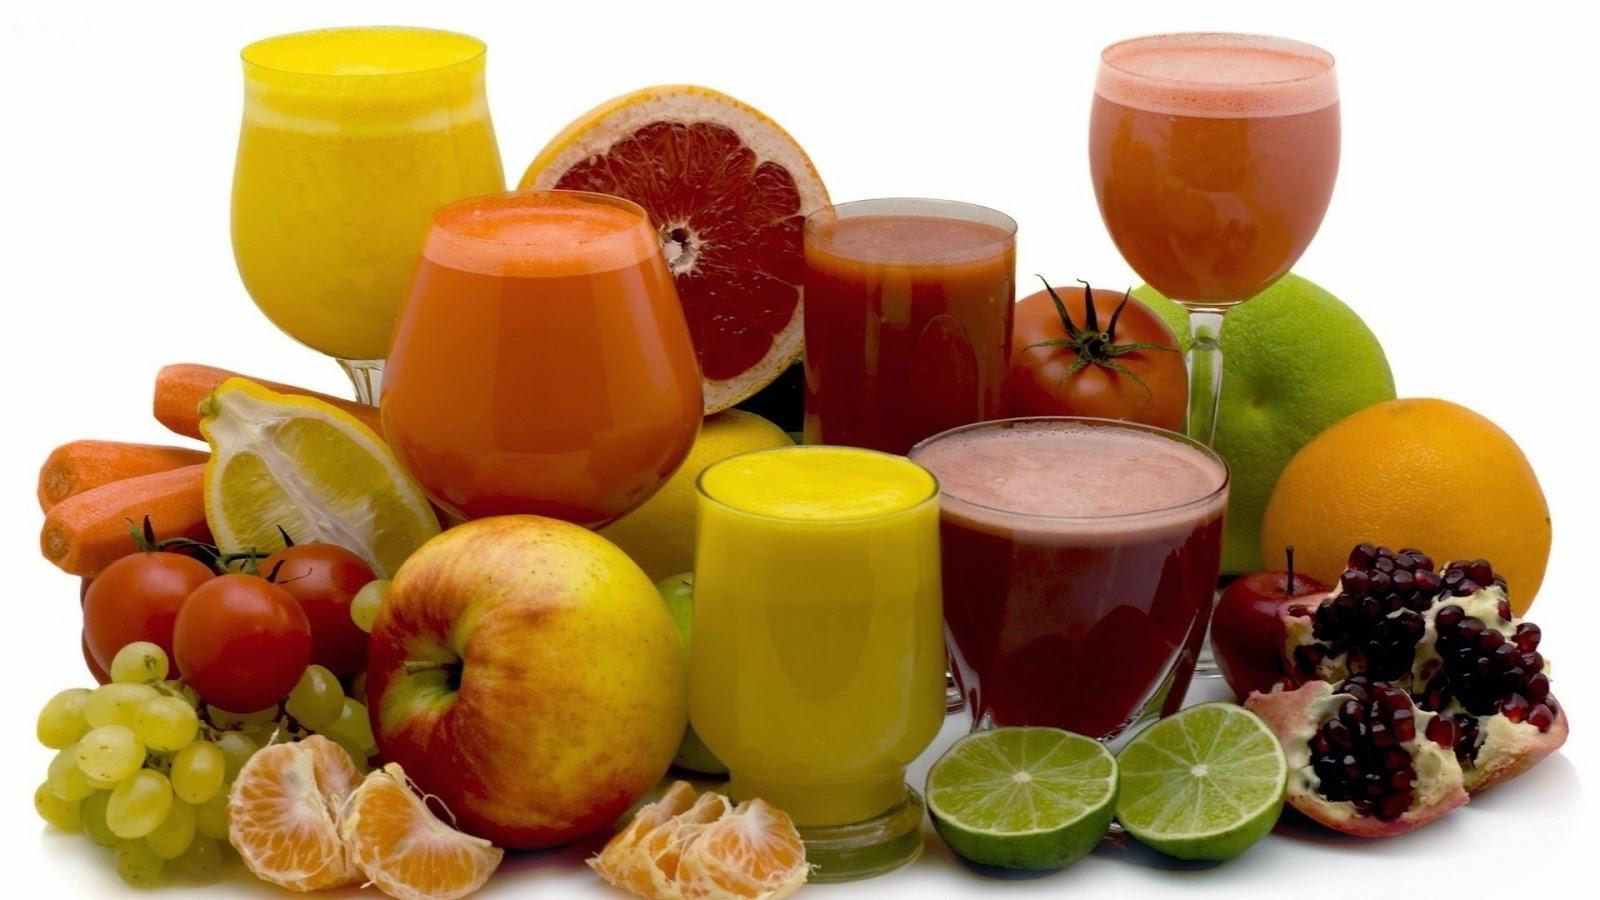 jus buahan